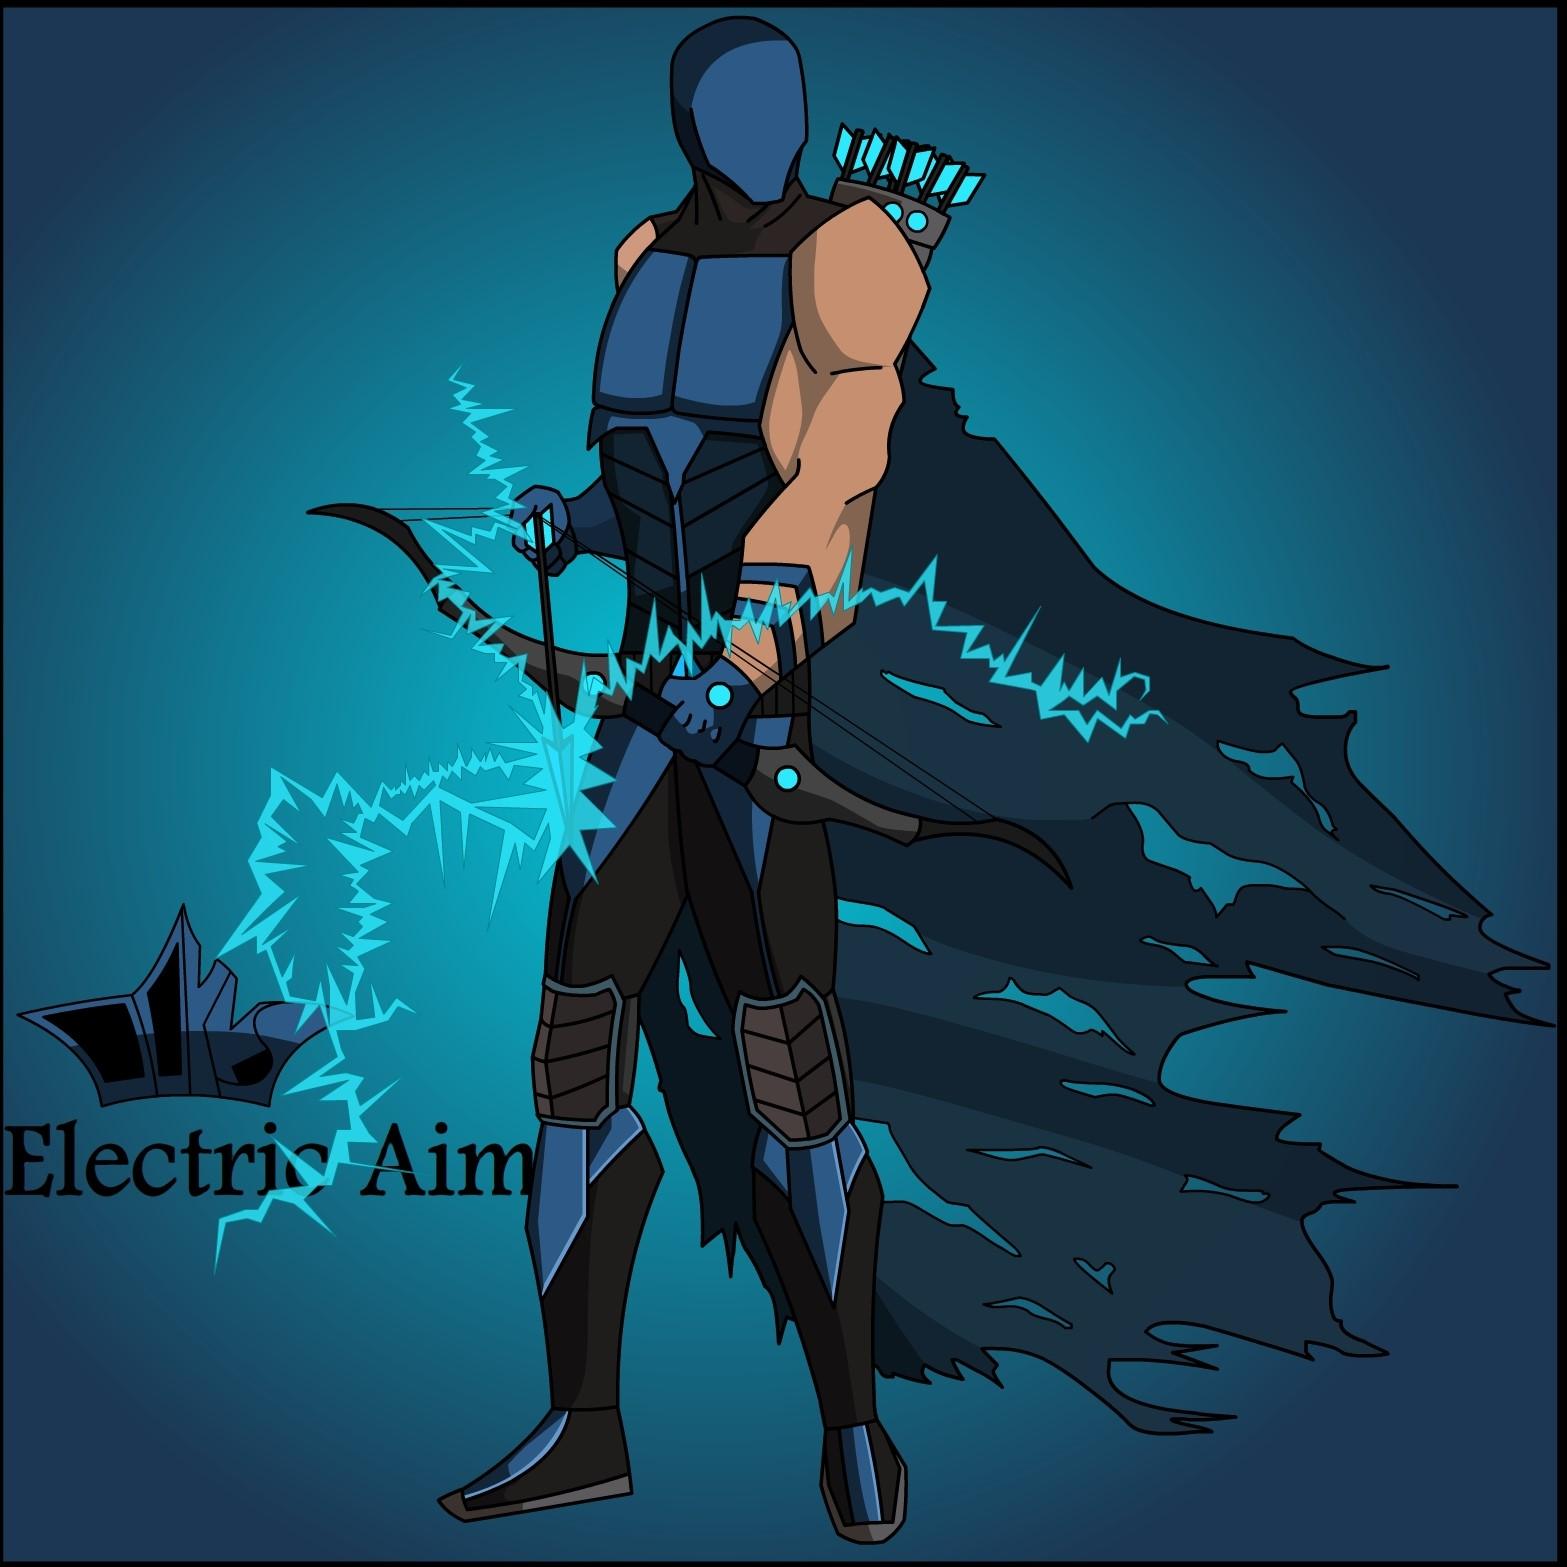 Electric Aim.